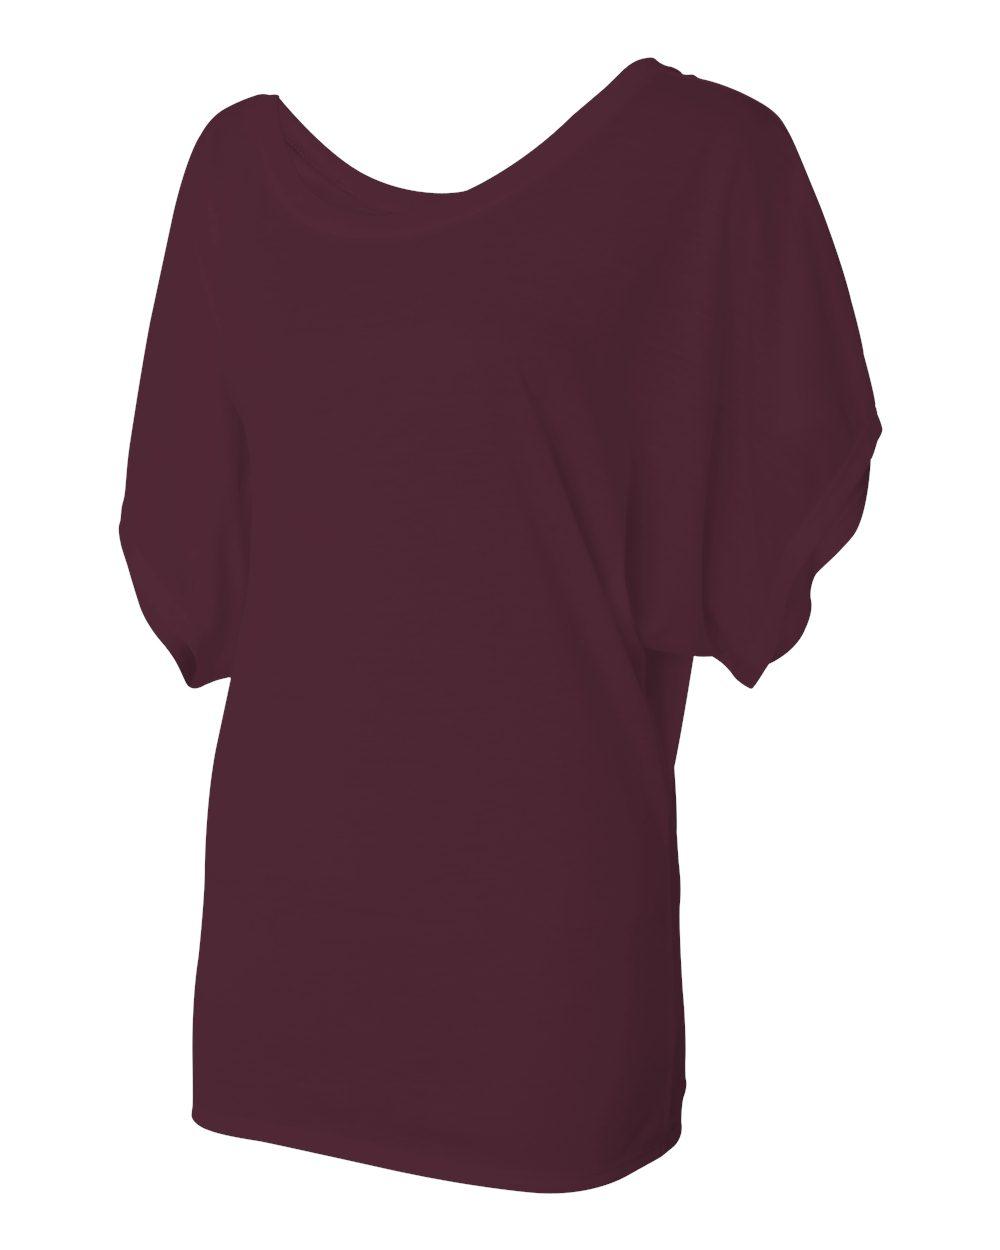 Bella-Canvas-Women-039-s-Flowy-Draped-Sleeve-Dolman-T-Shirt-8821-S-2XL thumbnail 12